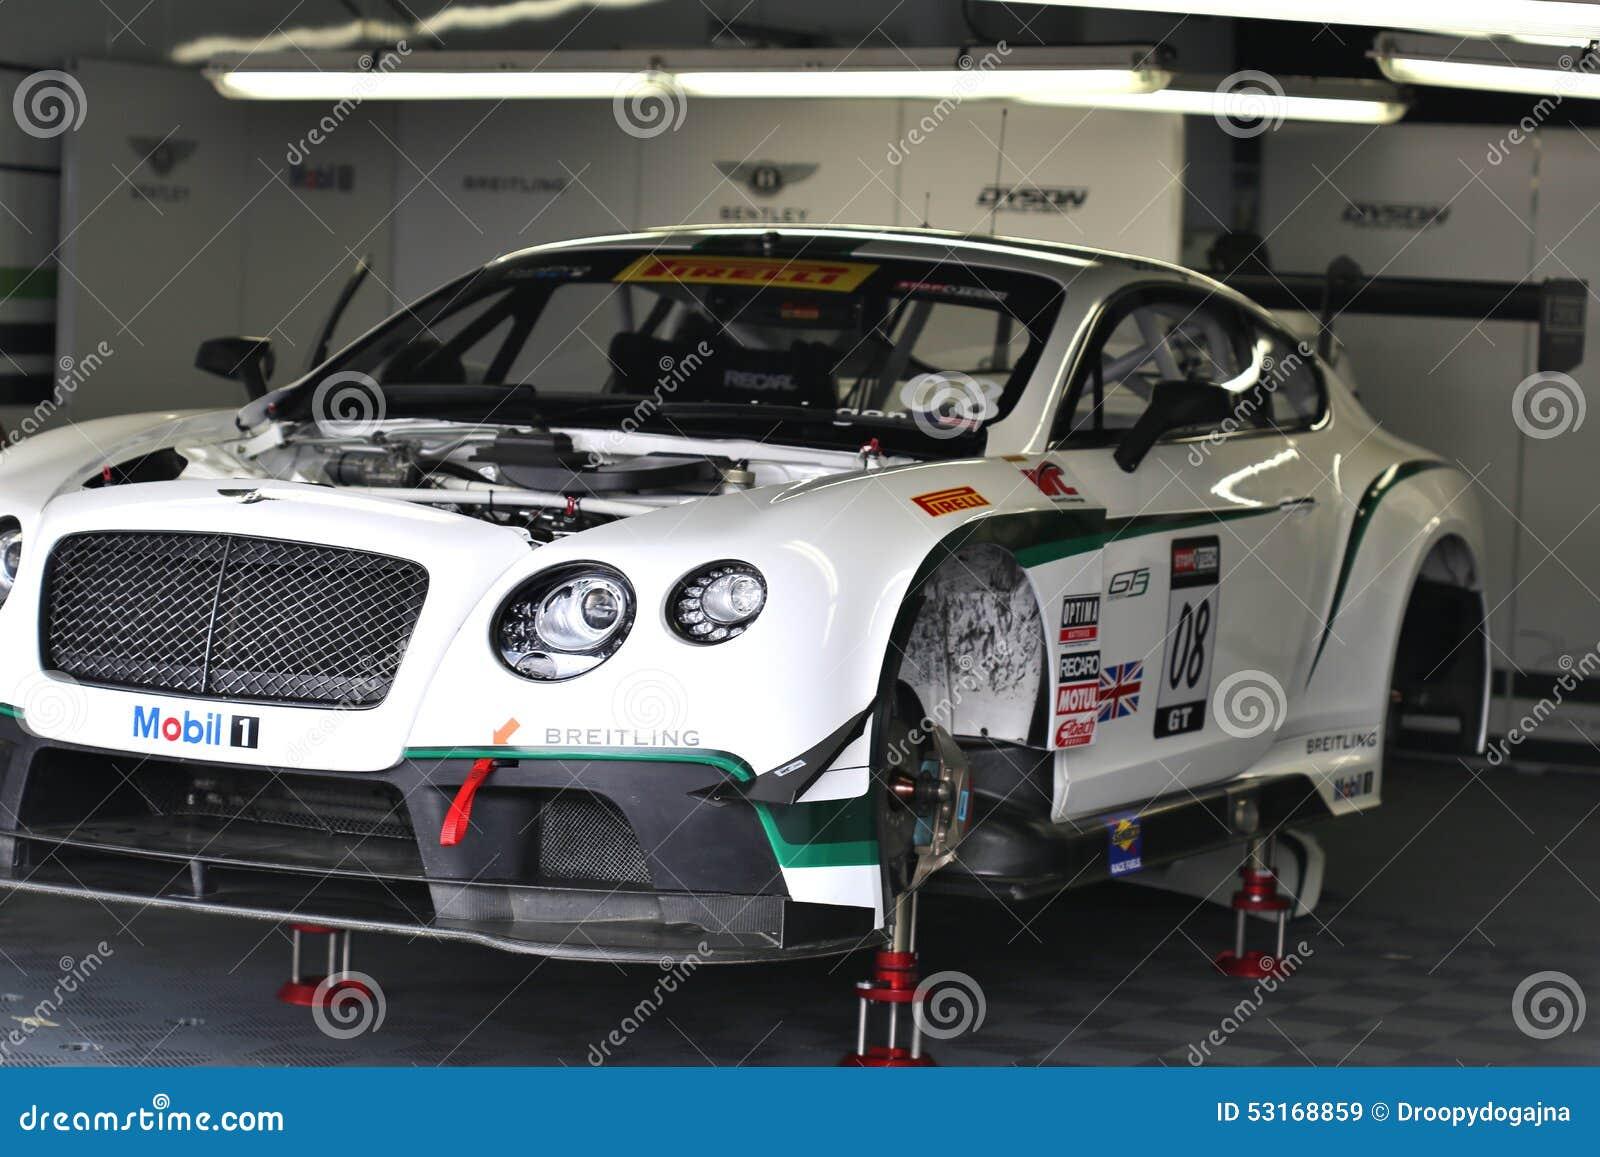 Team bentley gt3 editorial stock image image of bentley for Max motor dreams cost